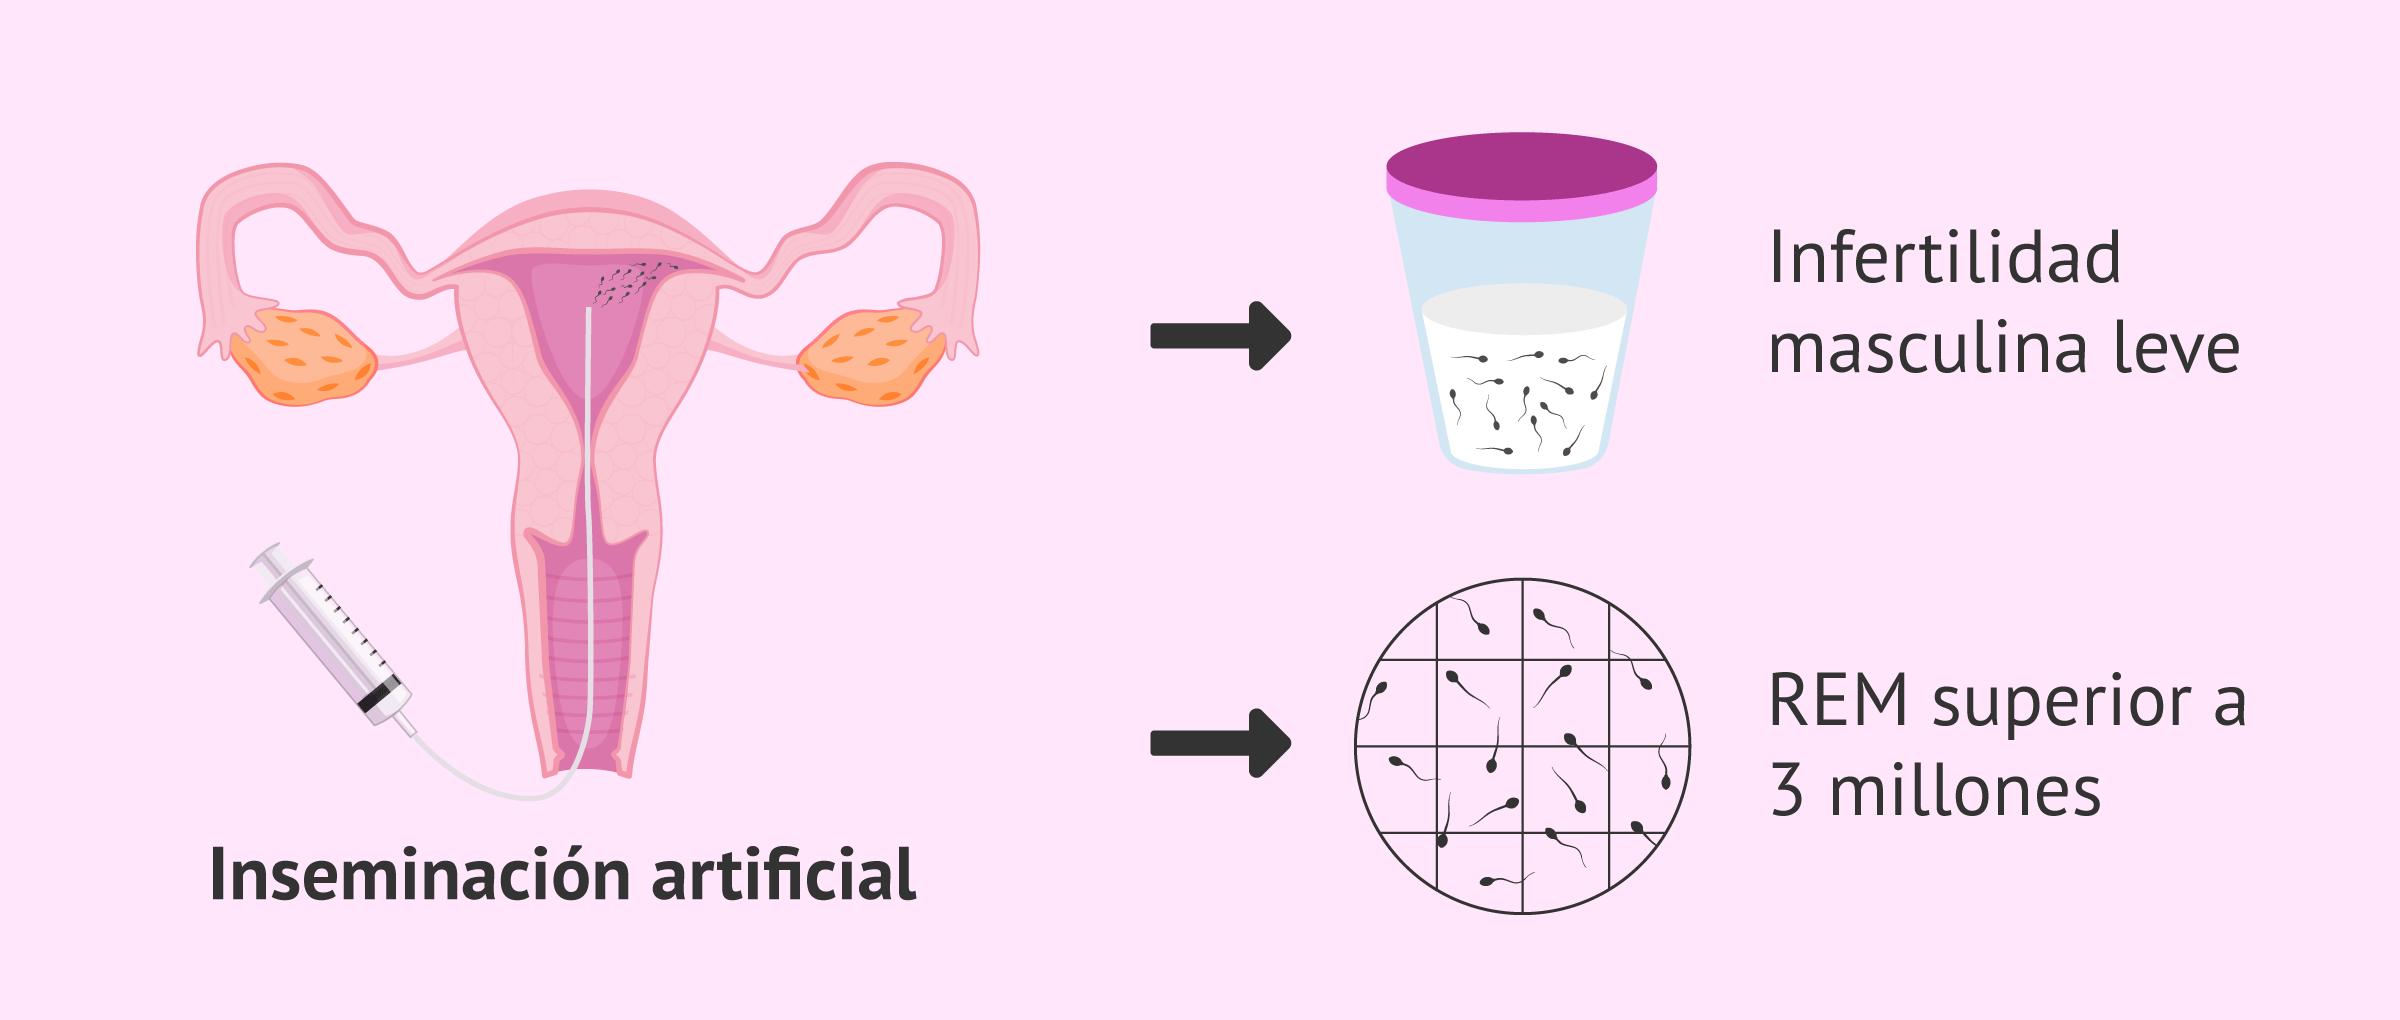 IA por infertilidad masculina